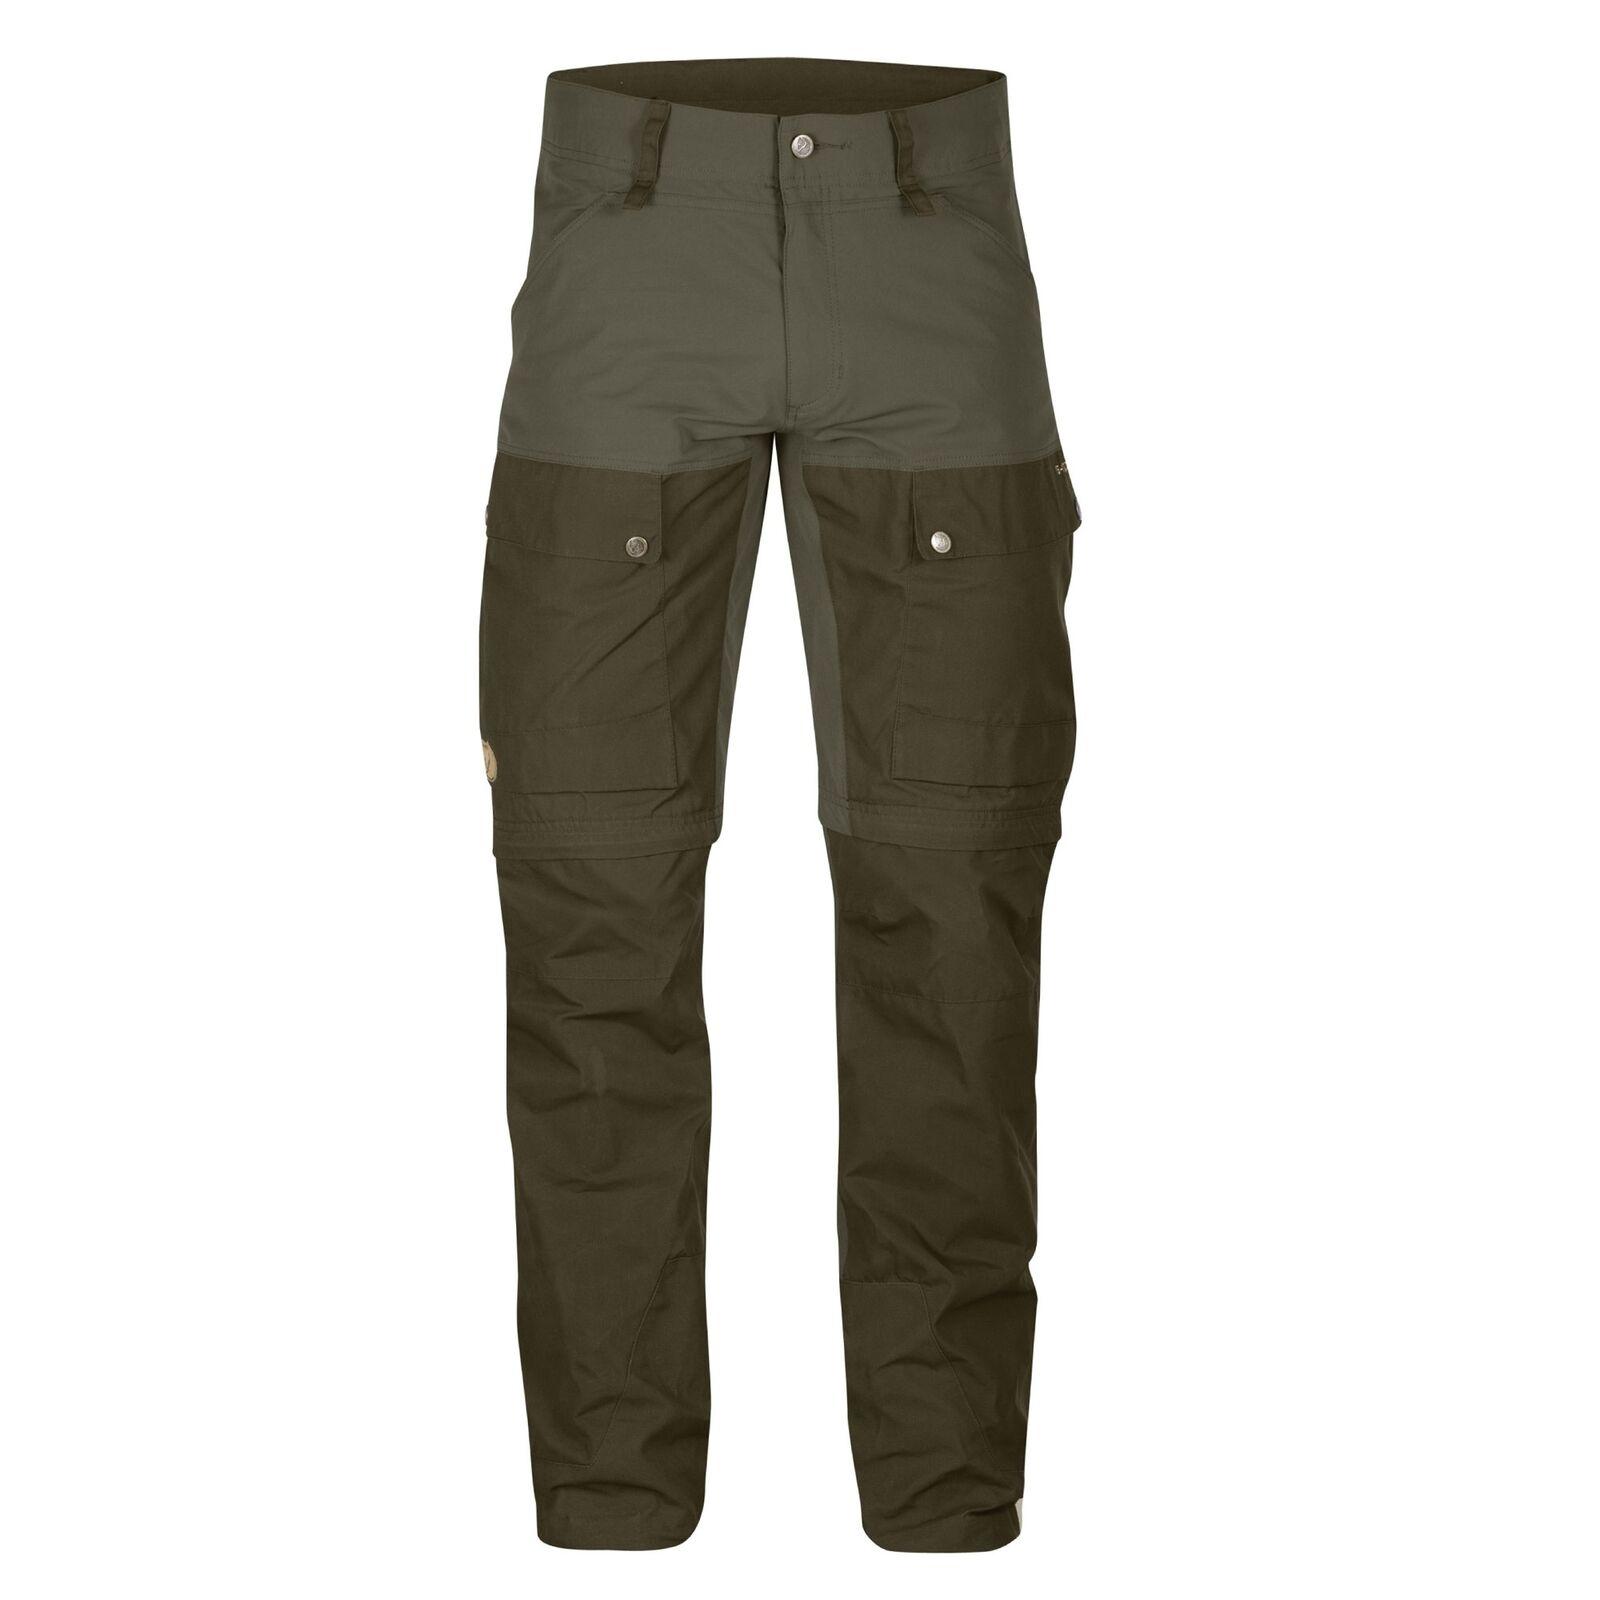 Fjäll Räven Hose Keb Gaiter Trousers 246/633 Gr. 50-56 - Tarmac Zip Off G-1000